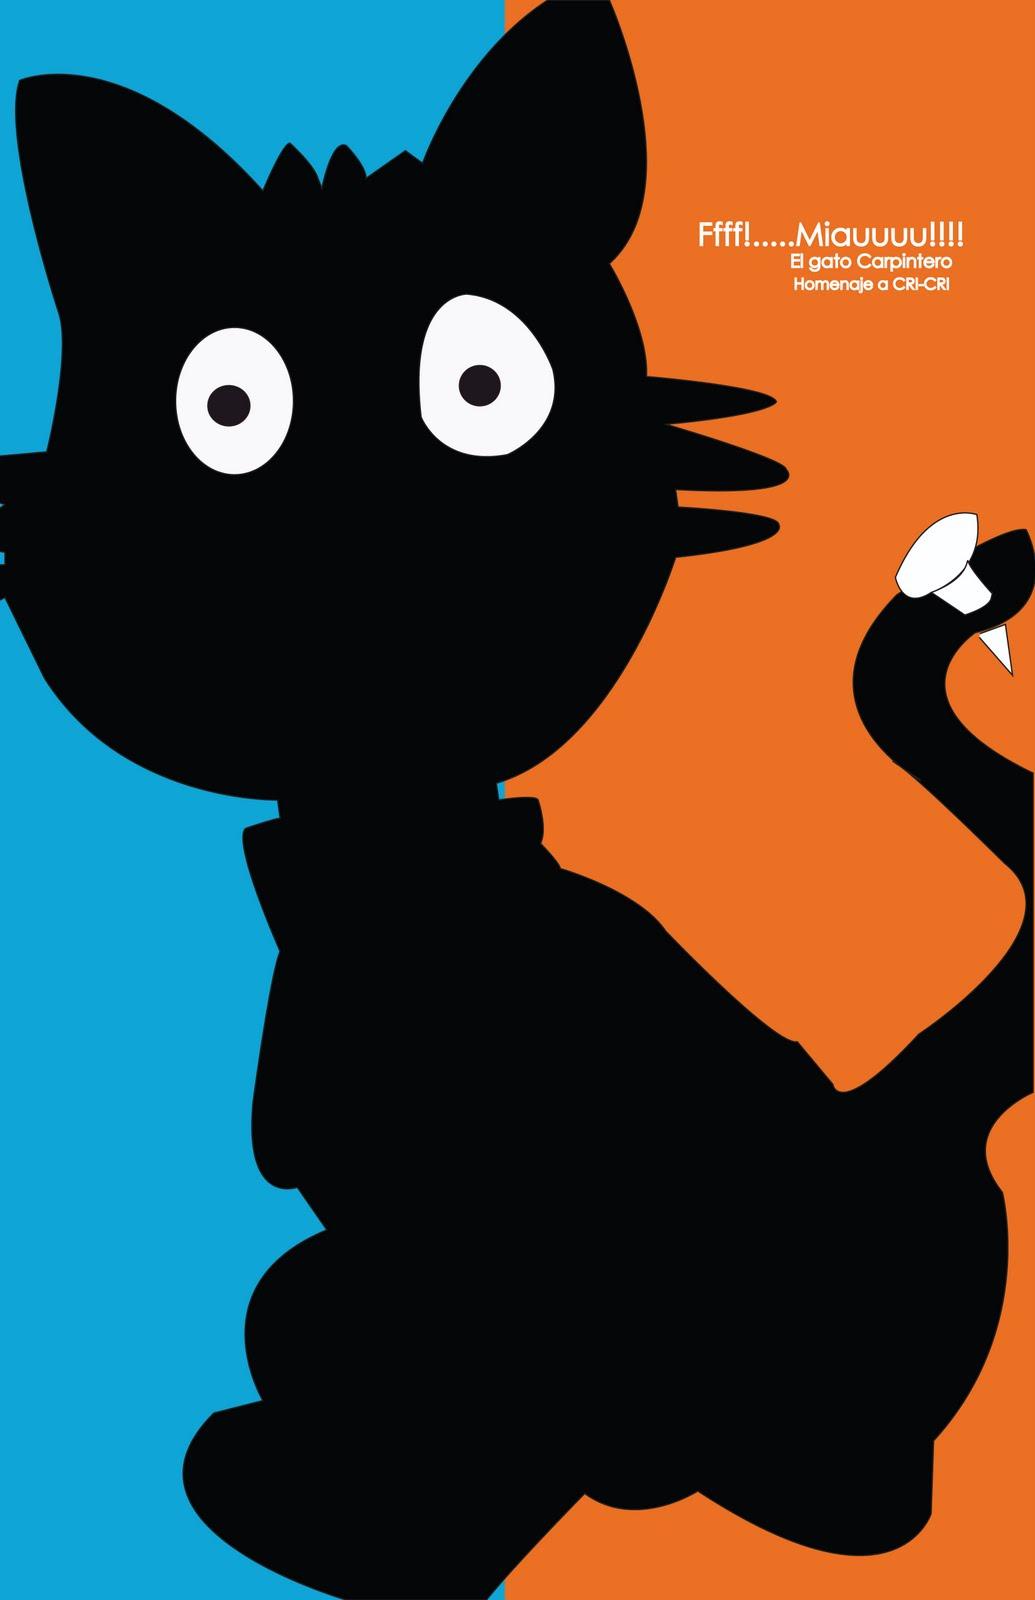 Dise o y comunicaci n 2 parcial cartel homenaje a cri cri for Gato de carpintero